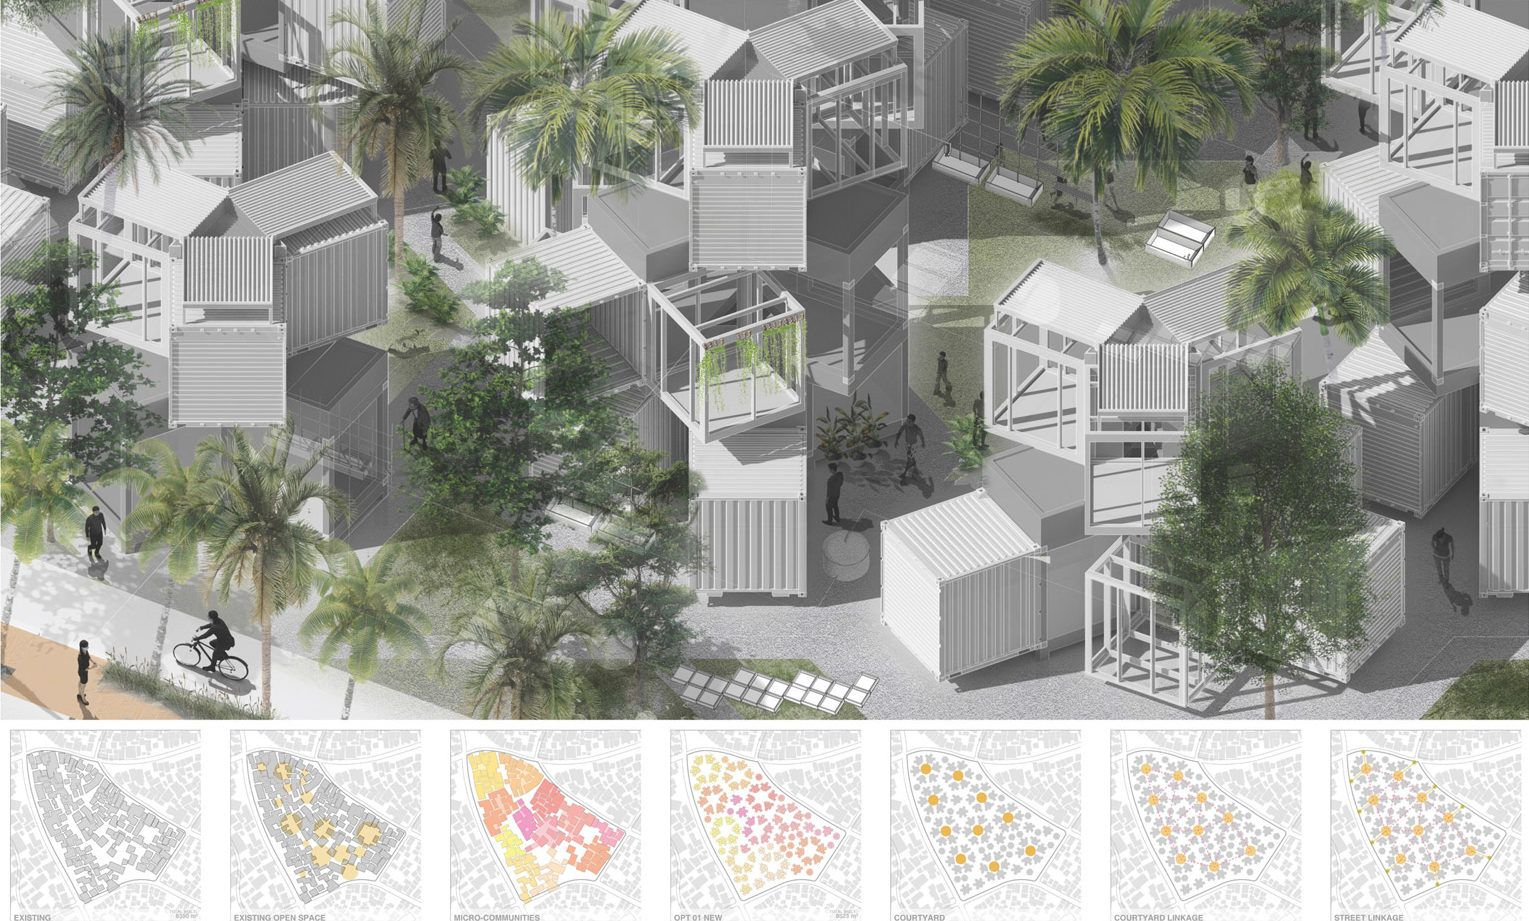 Housing Politics Climate Change Ecology Range Of Student